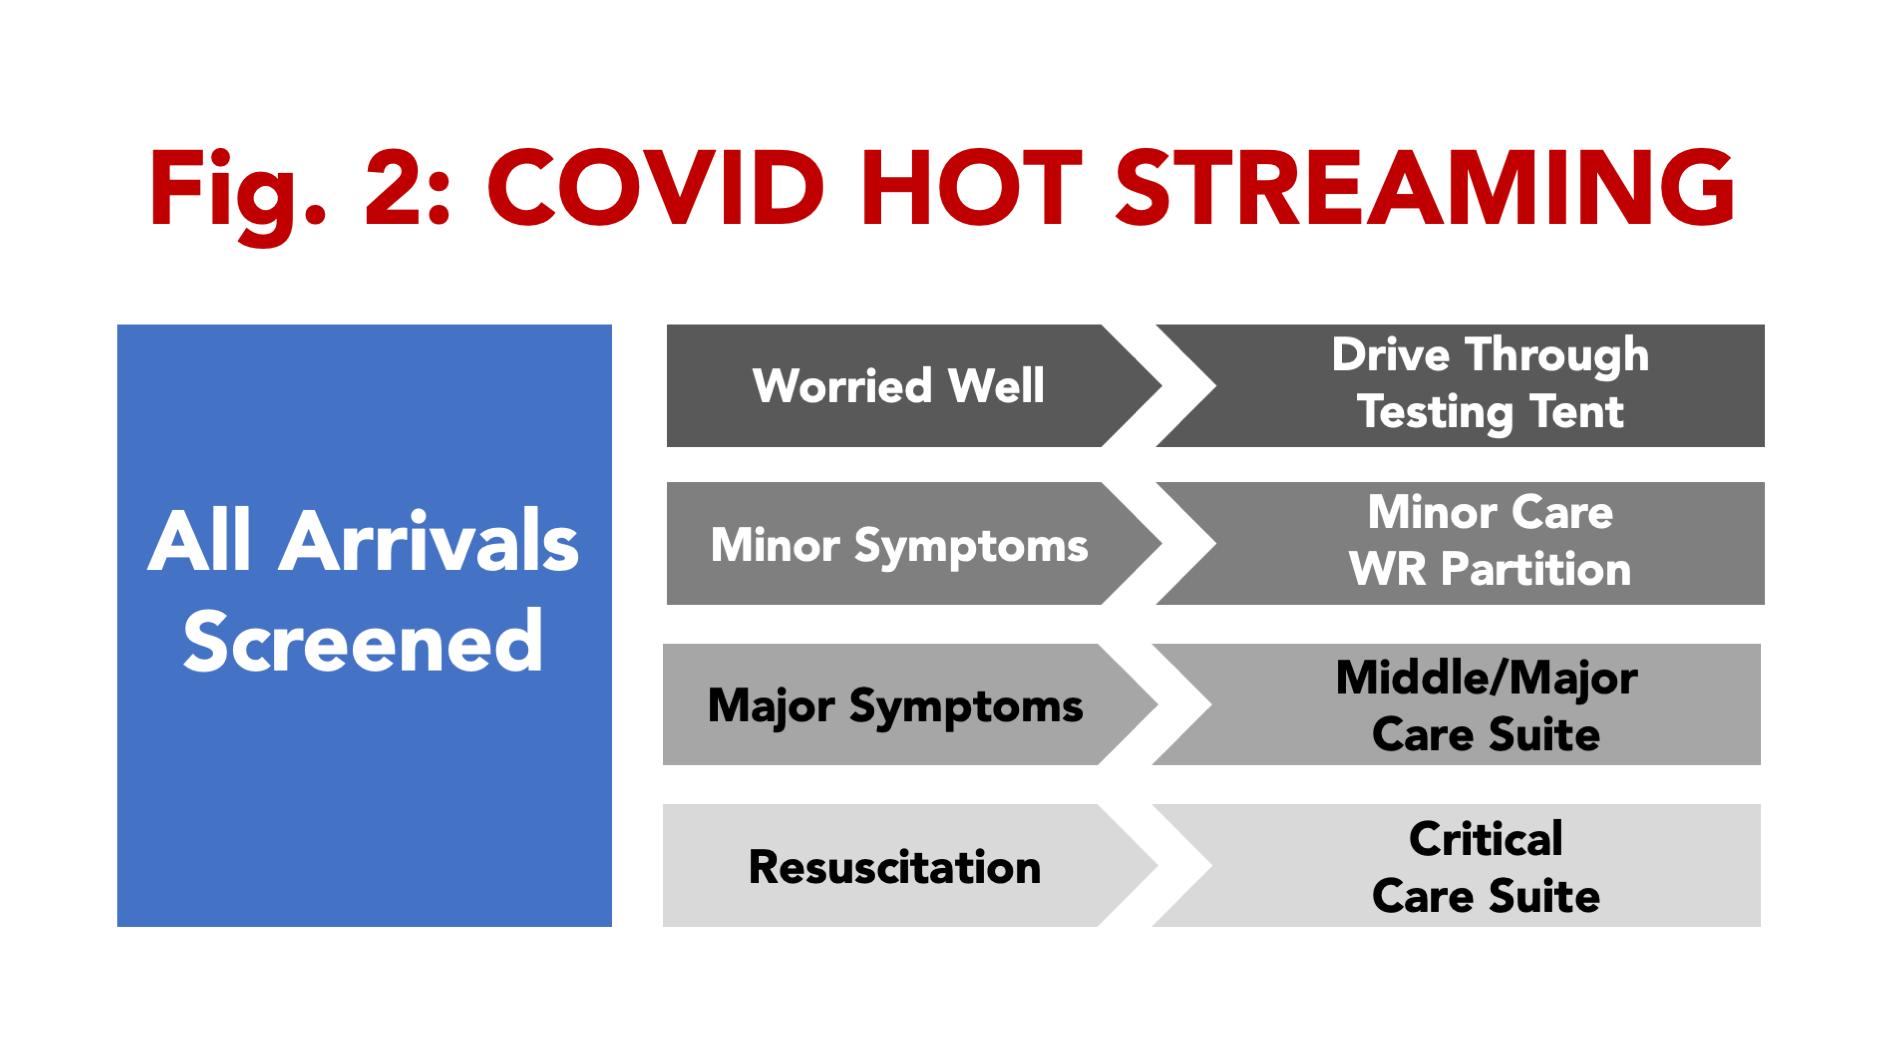 COVID HOT STREAMING